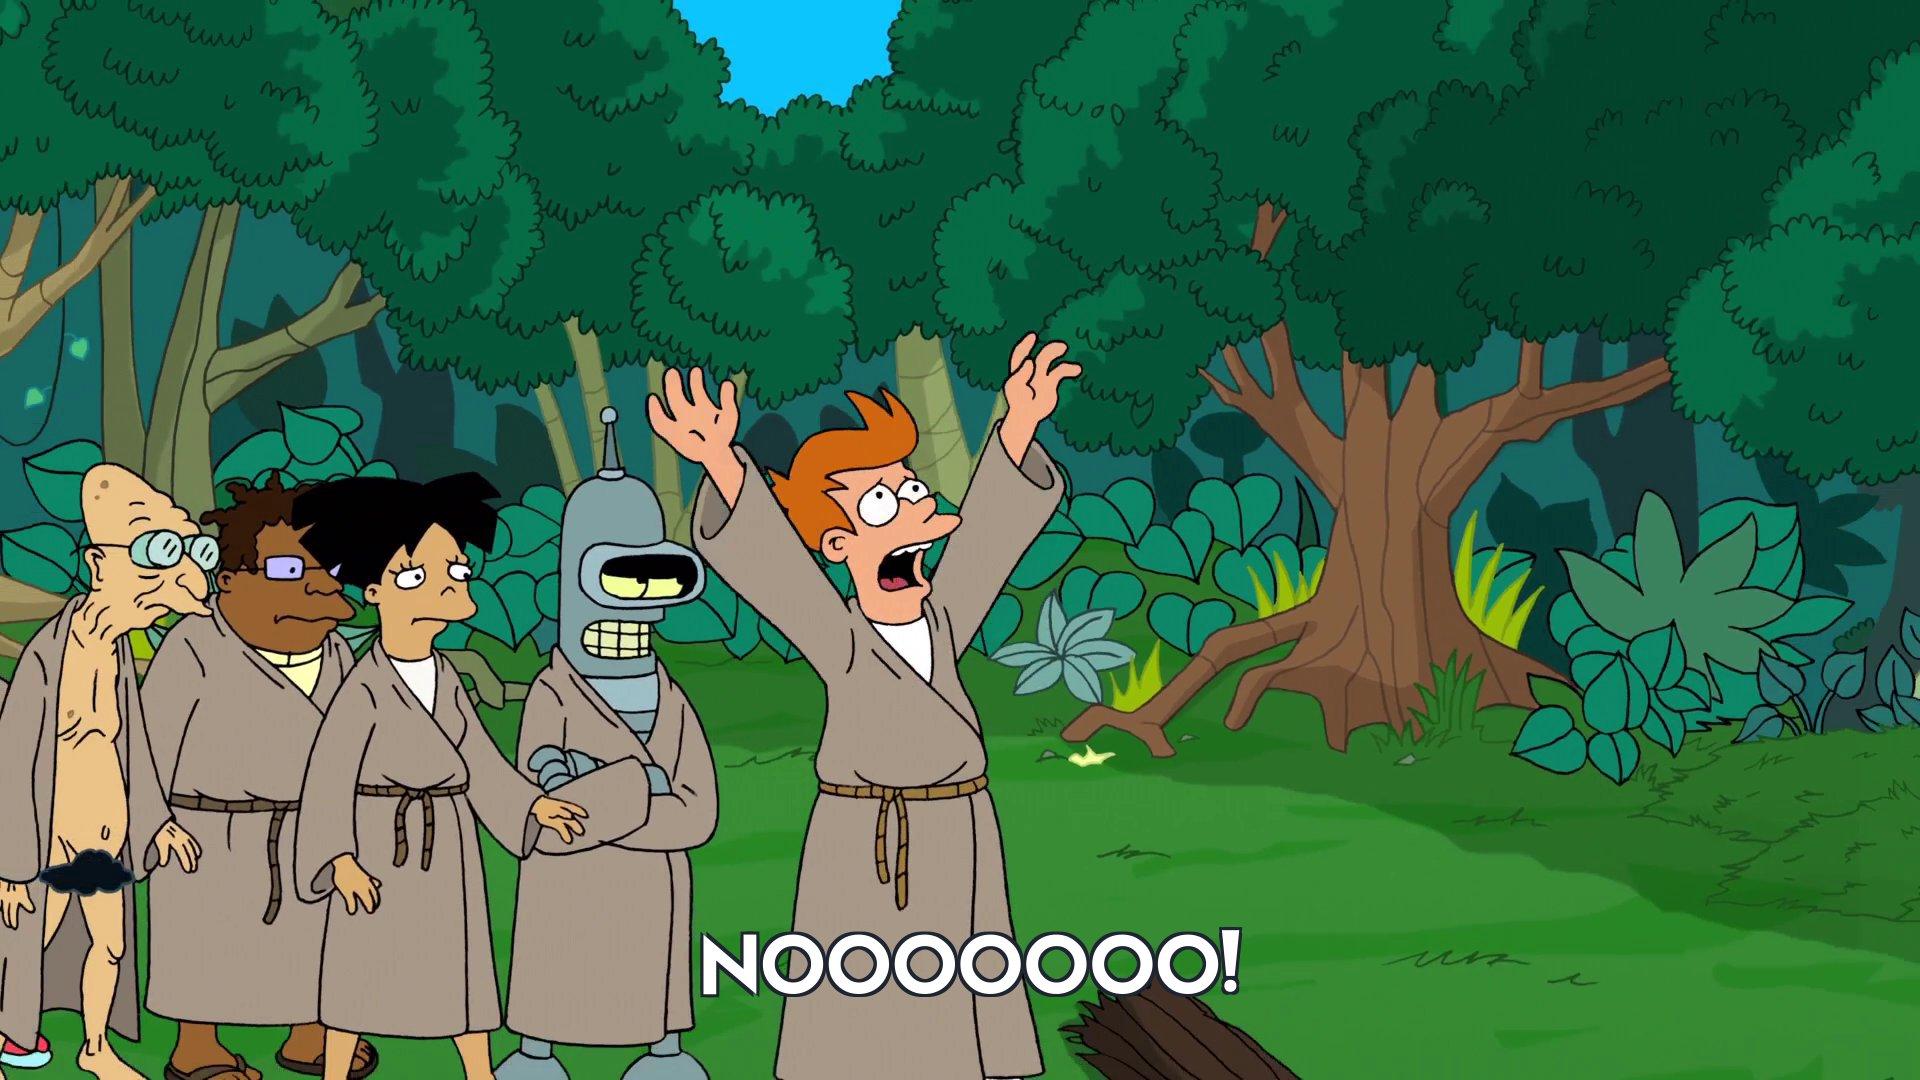 Philip J Fry: Nooooooo!